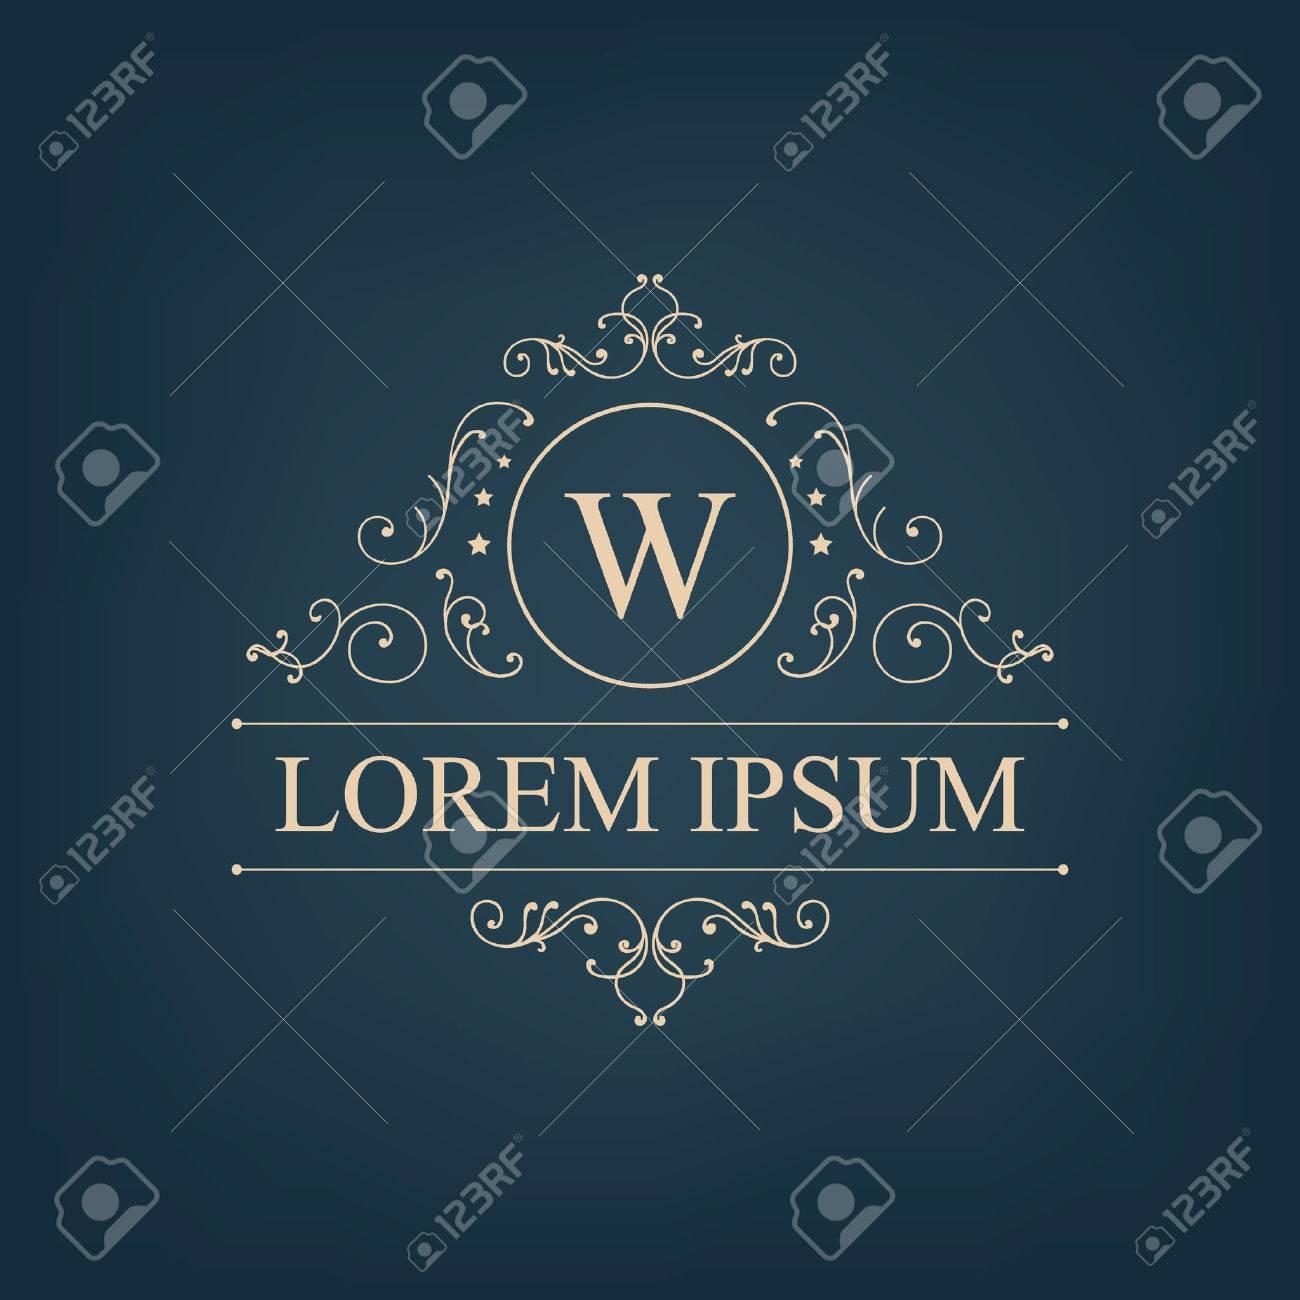 Vector luxury, royal monogram logo, icon isolated. Vintage, retro rich baroque sign, company branding - 47401415